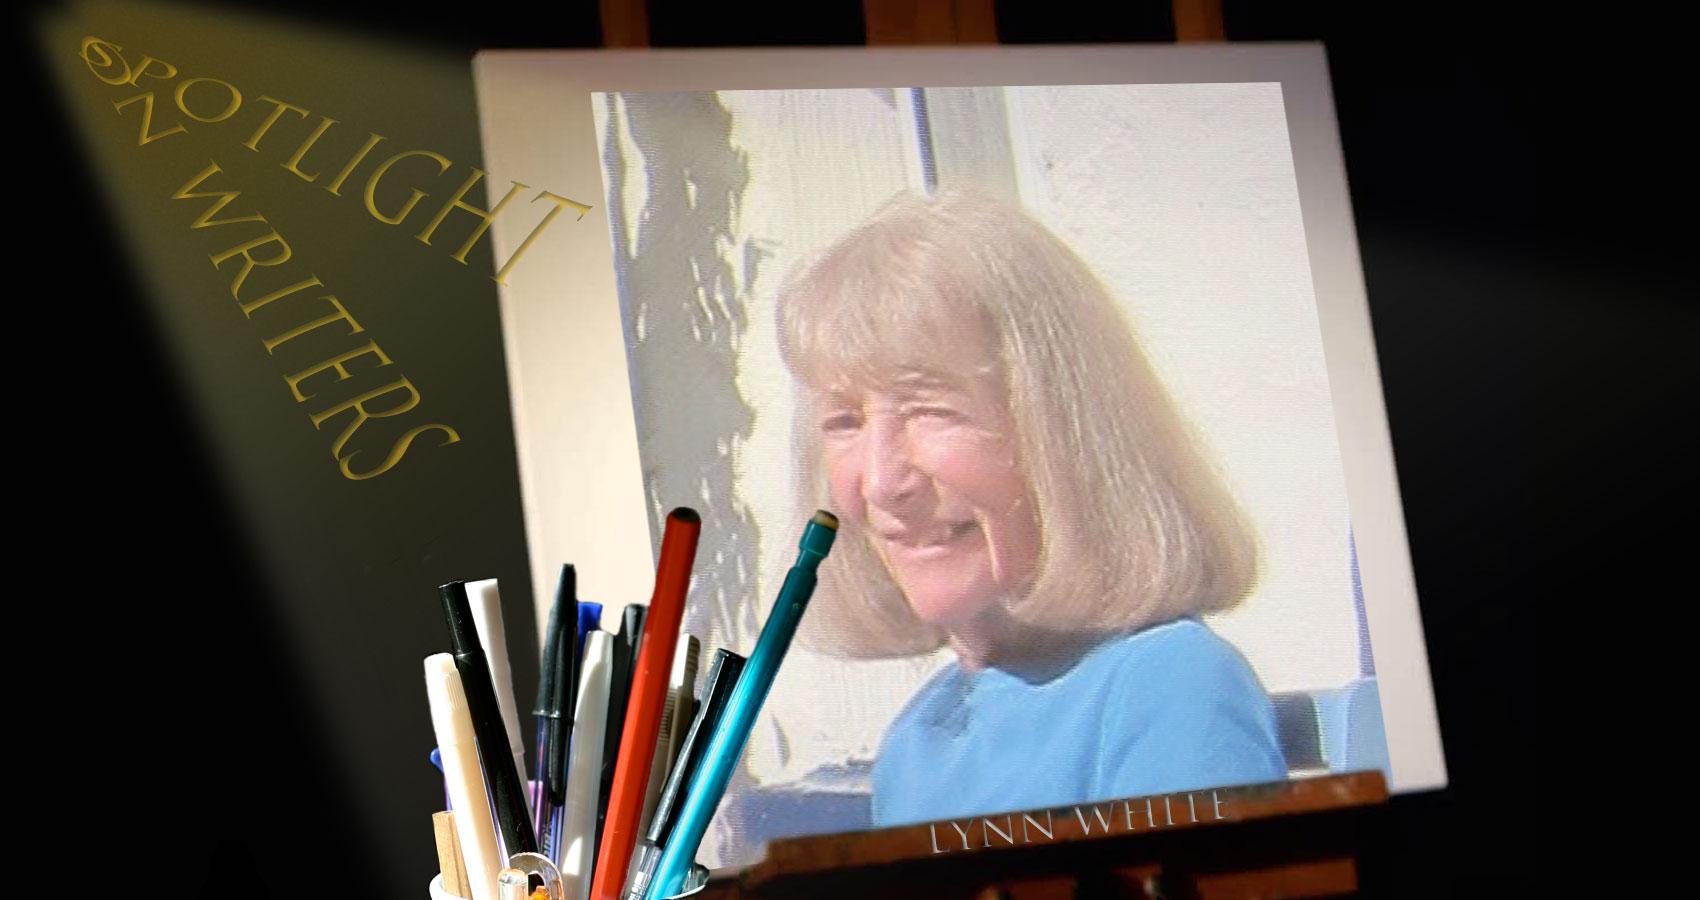 Spotlight On Writers - Lynn White at Spillwords.com